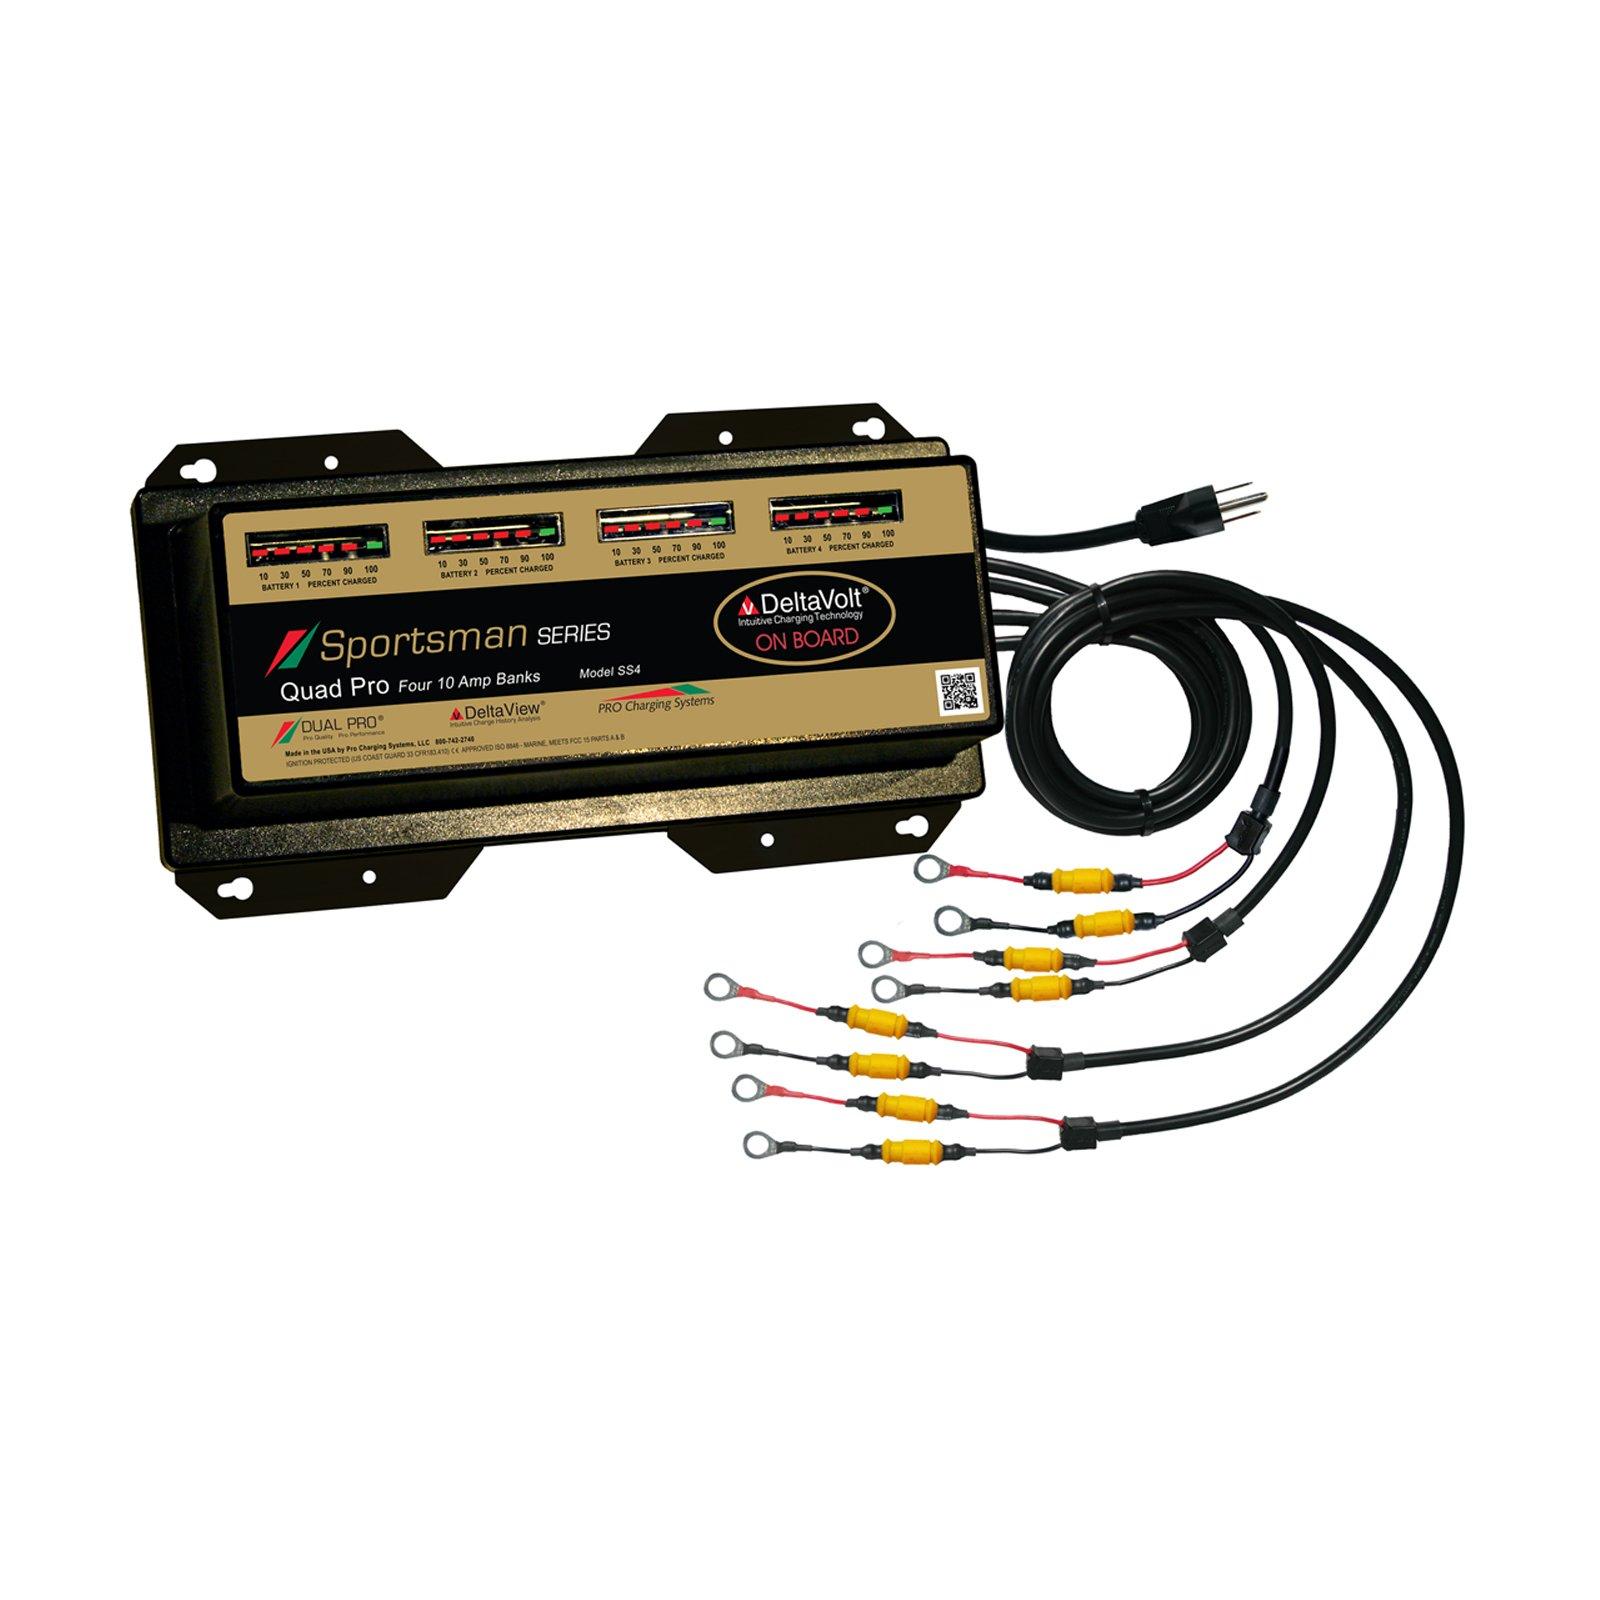 Dual Pro Sportsman Series 12 Volt 40 Amp Lithium Battery Charger Four 10 Amp Banks Battery Mart